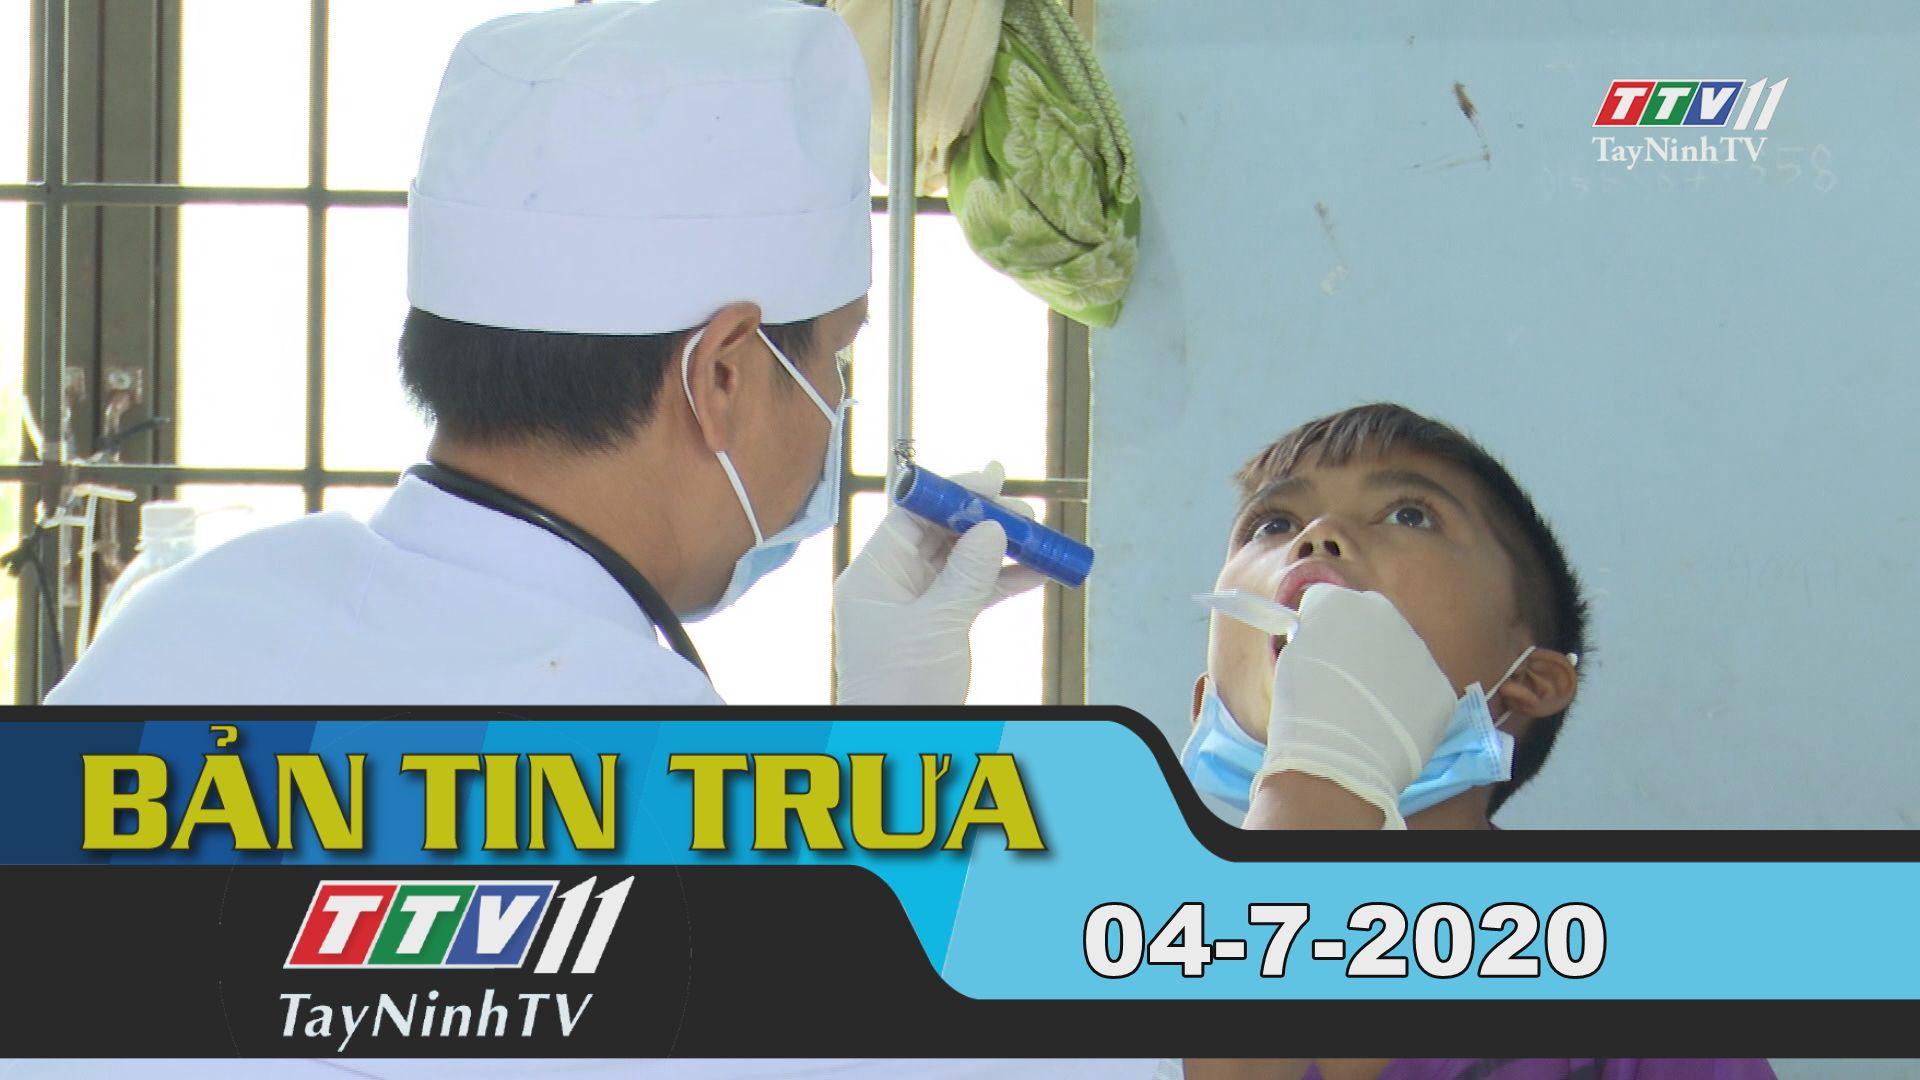 Bản tin trưa 04-7-2020 | Tin tức hôm nay | TayNinhTV